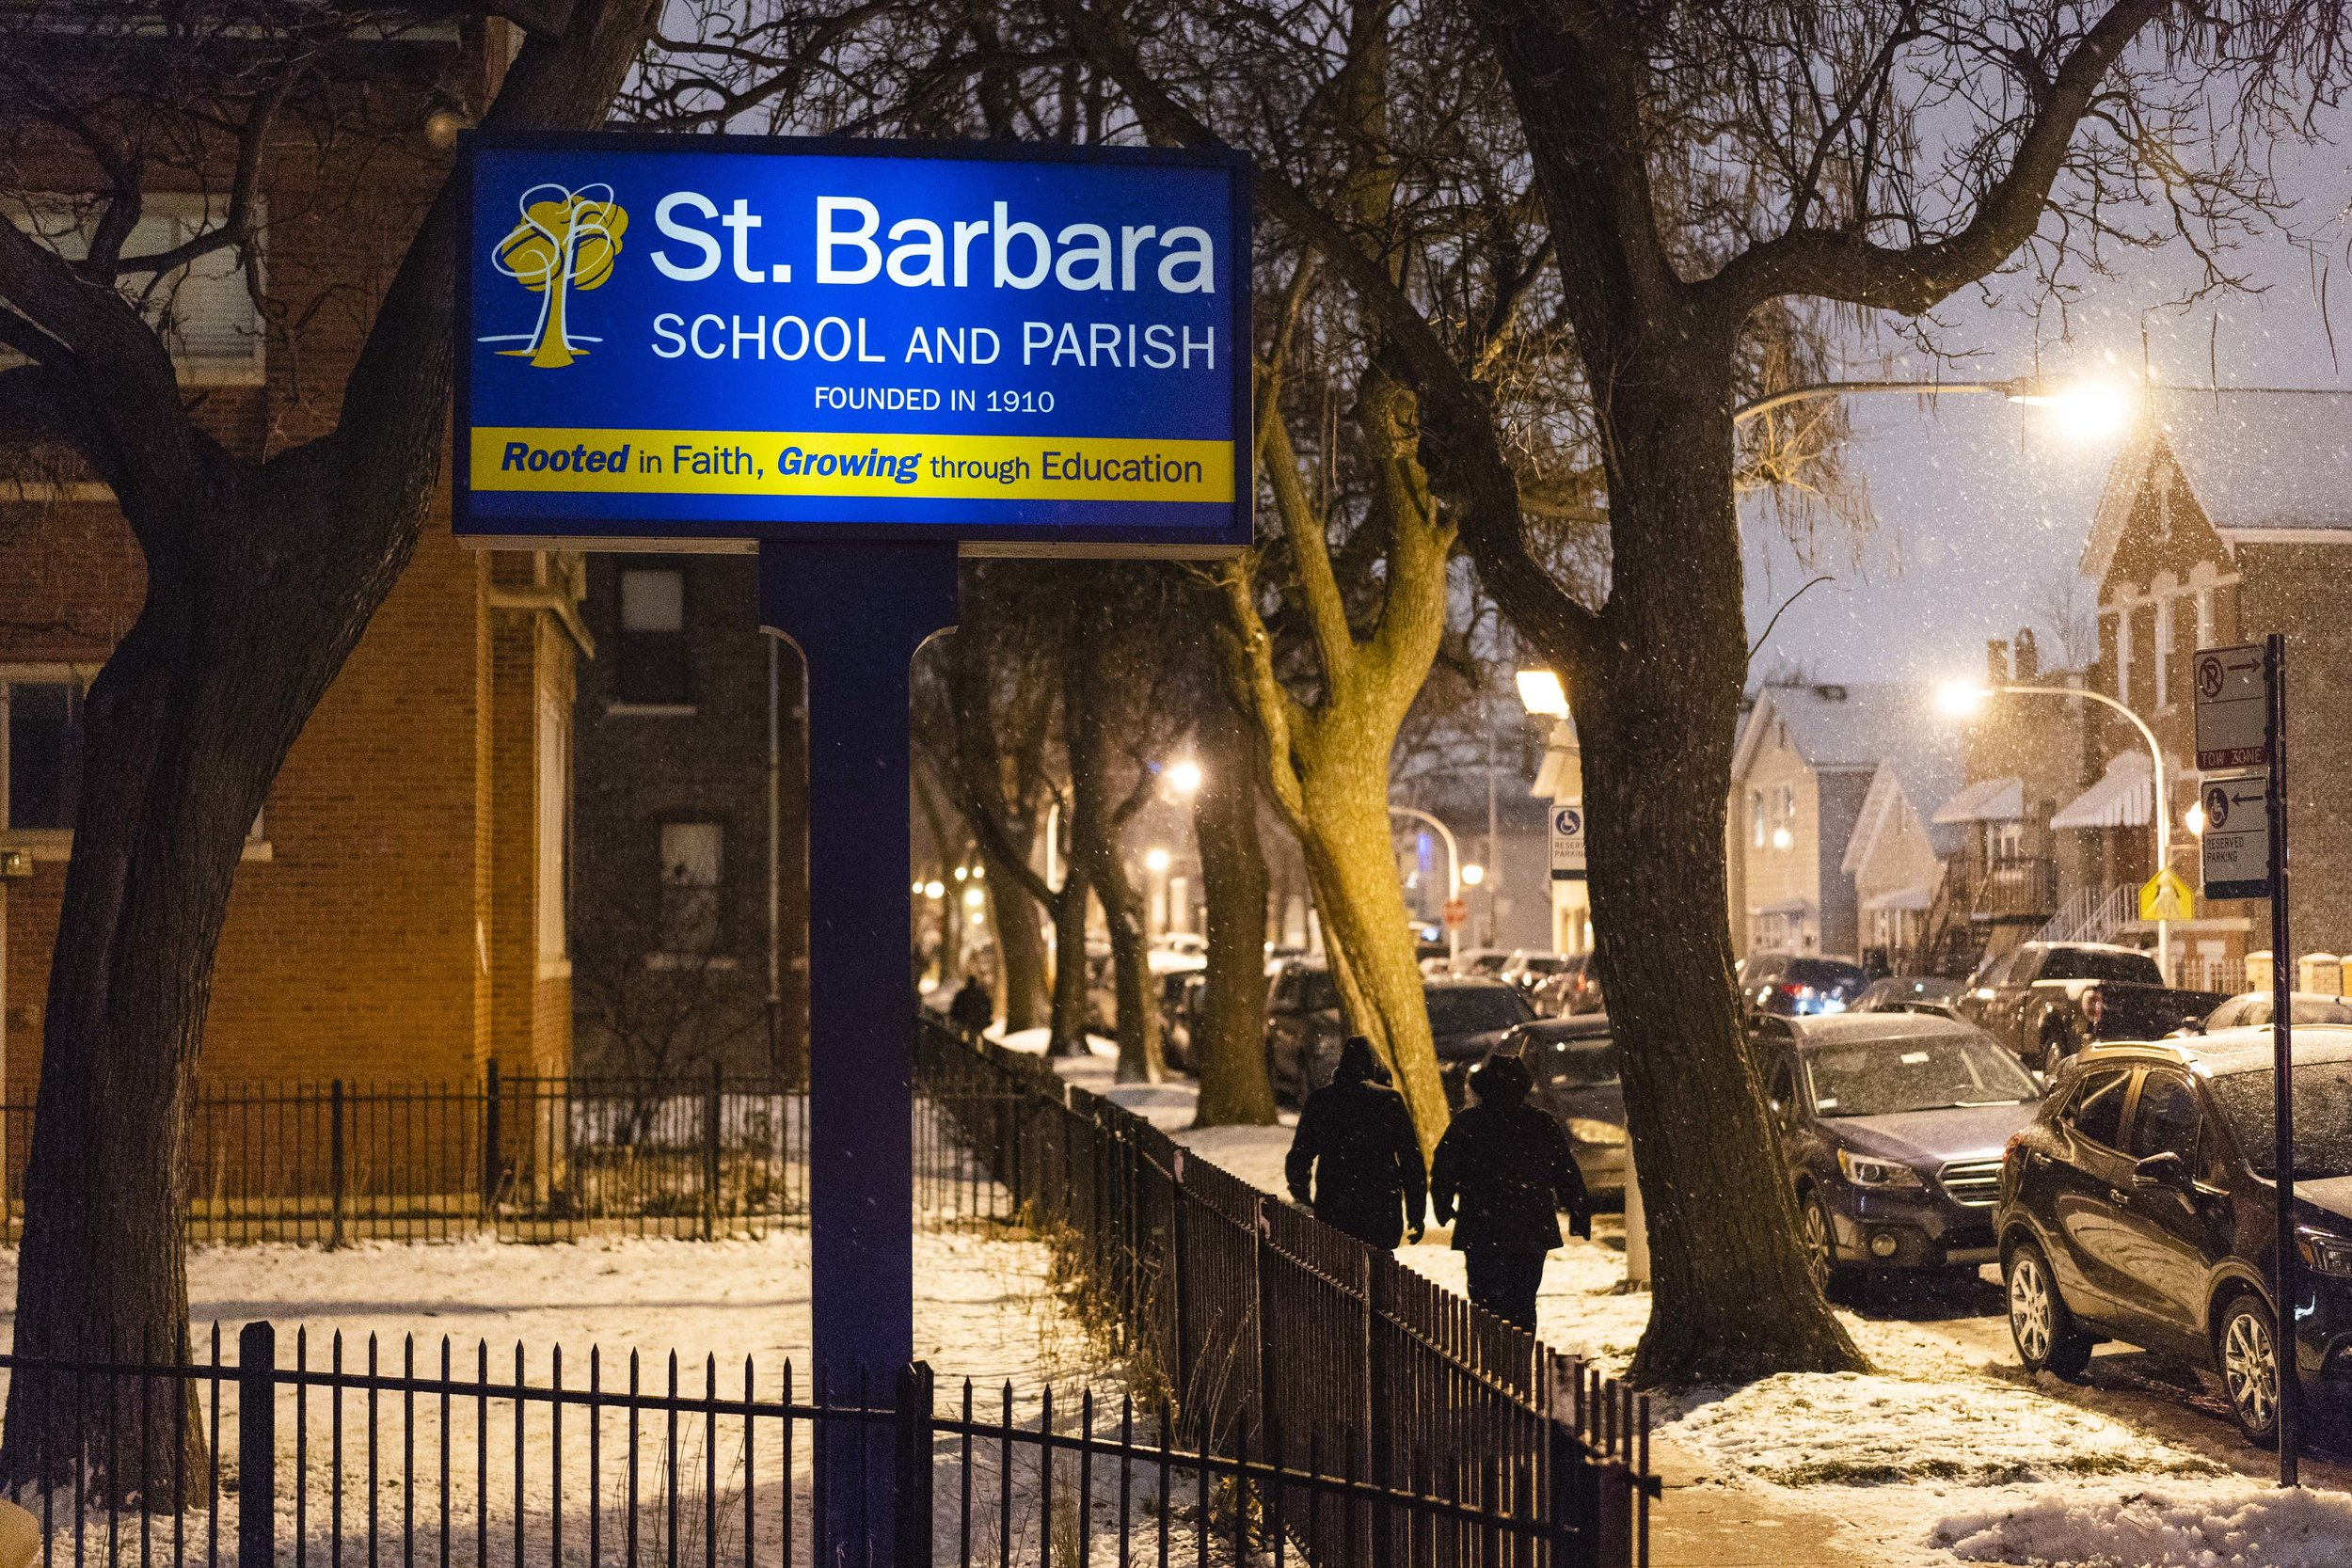 St. Barbara Parish and School were established in 1910.